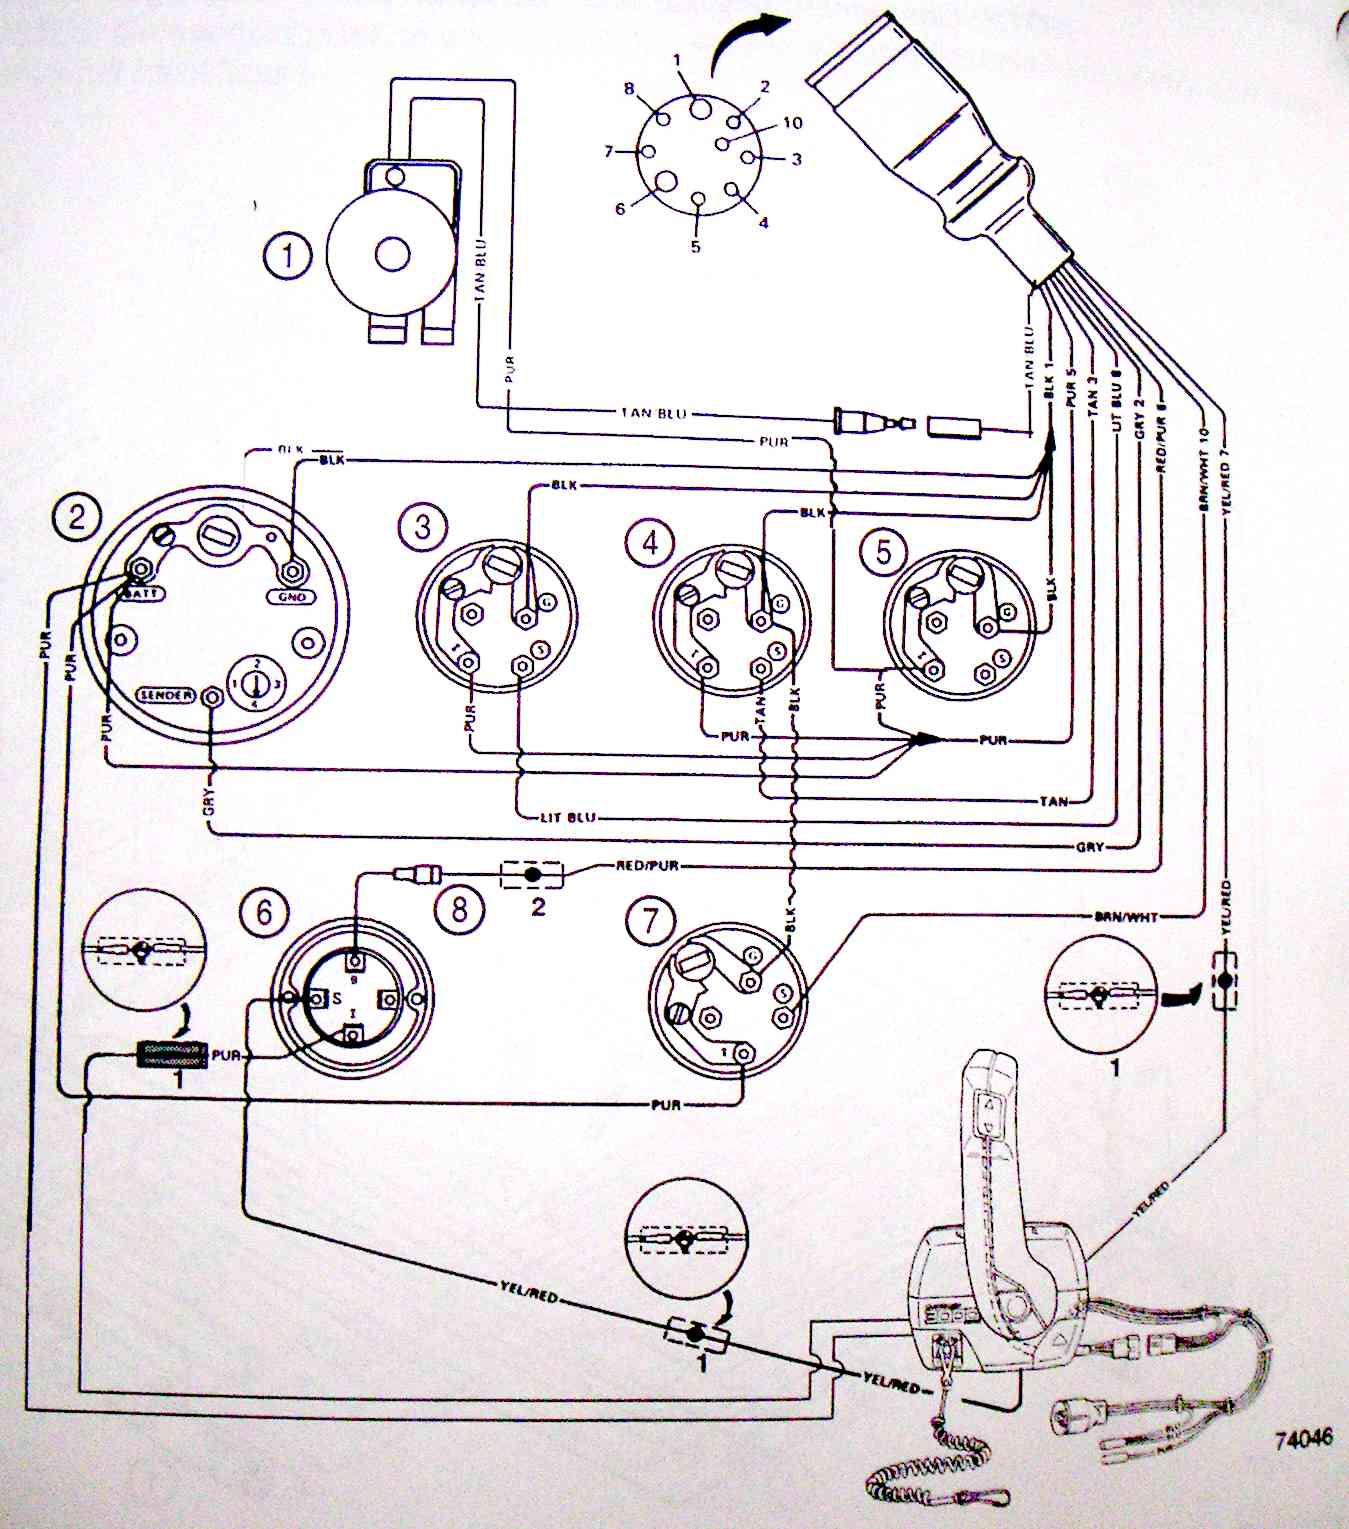 455 jet boat wiring diagram